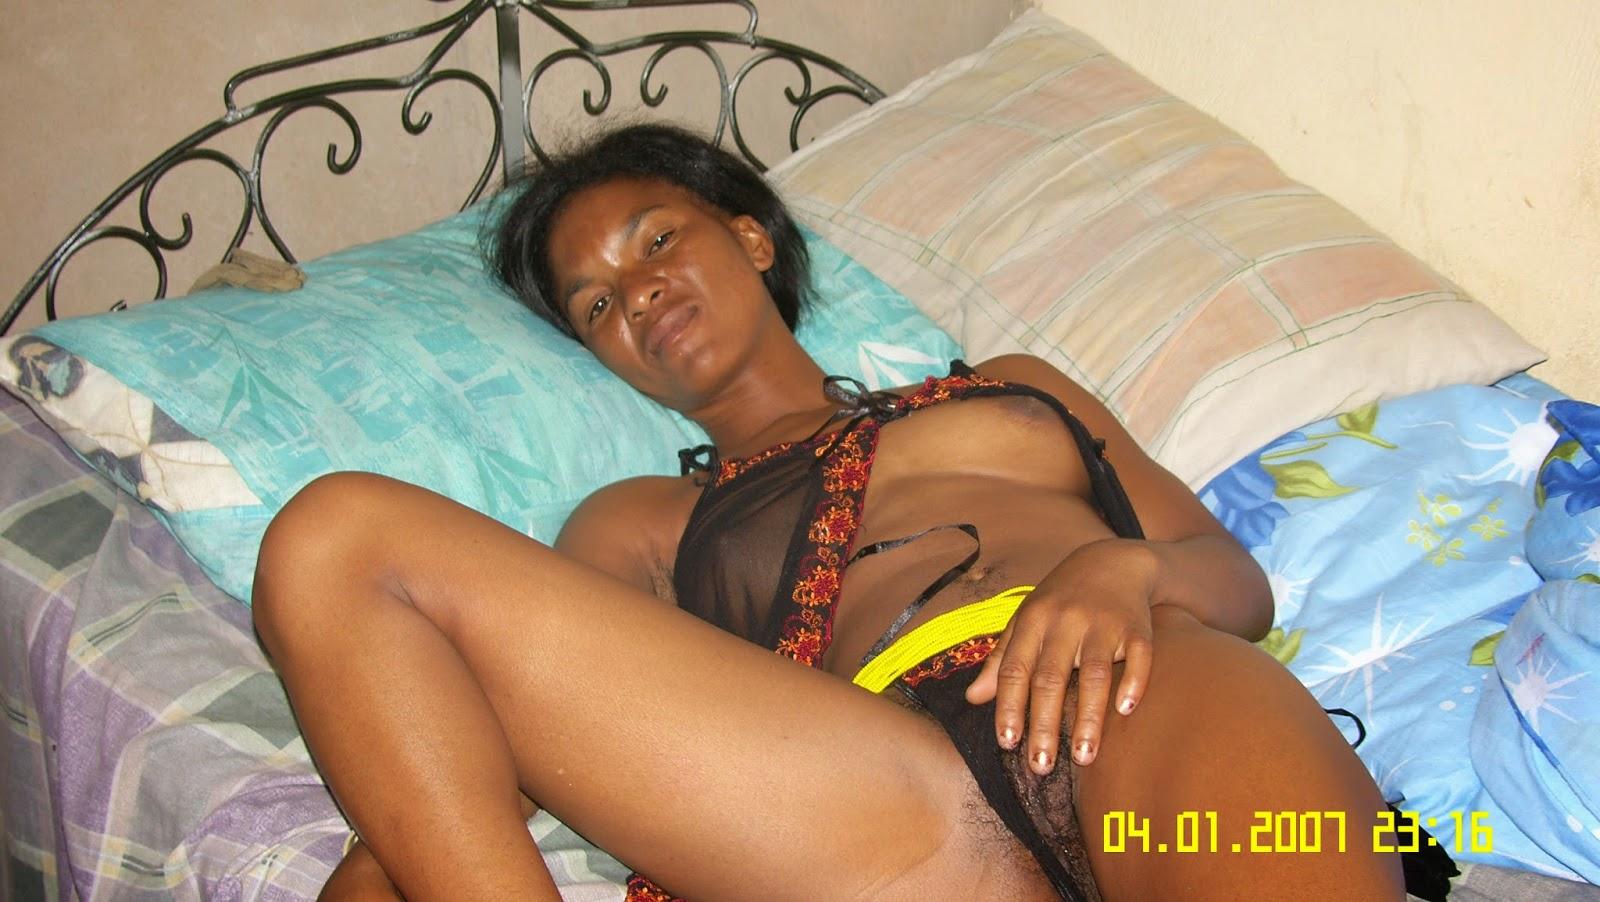 For Free angola porn pics commit error